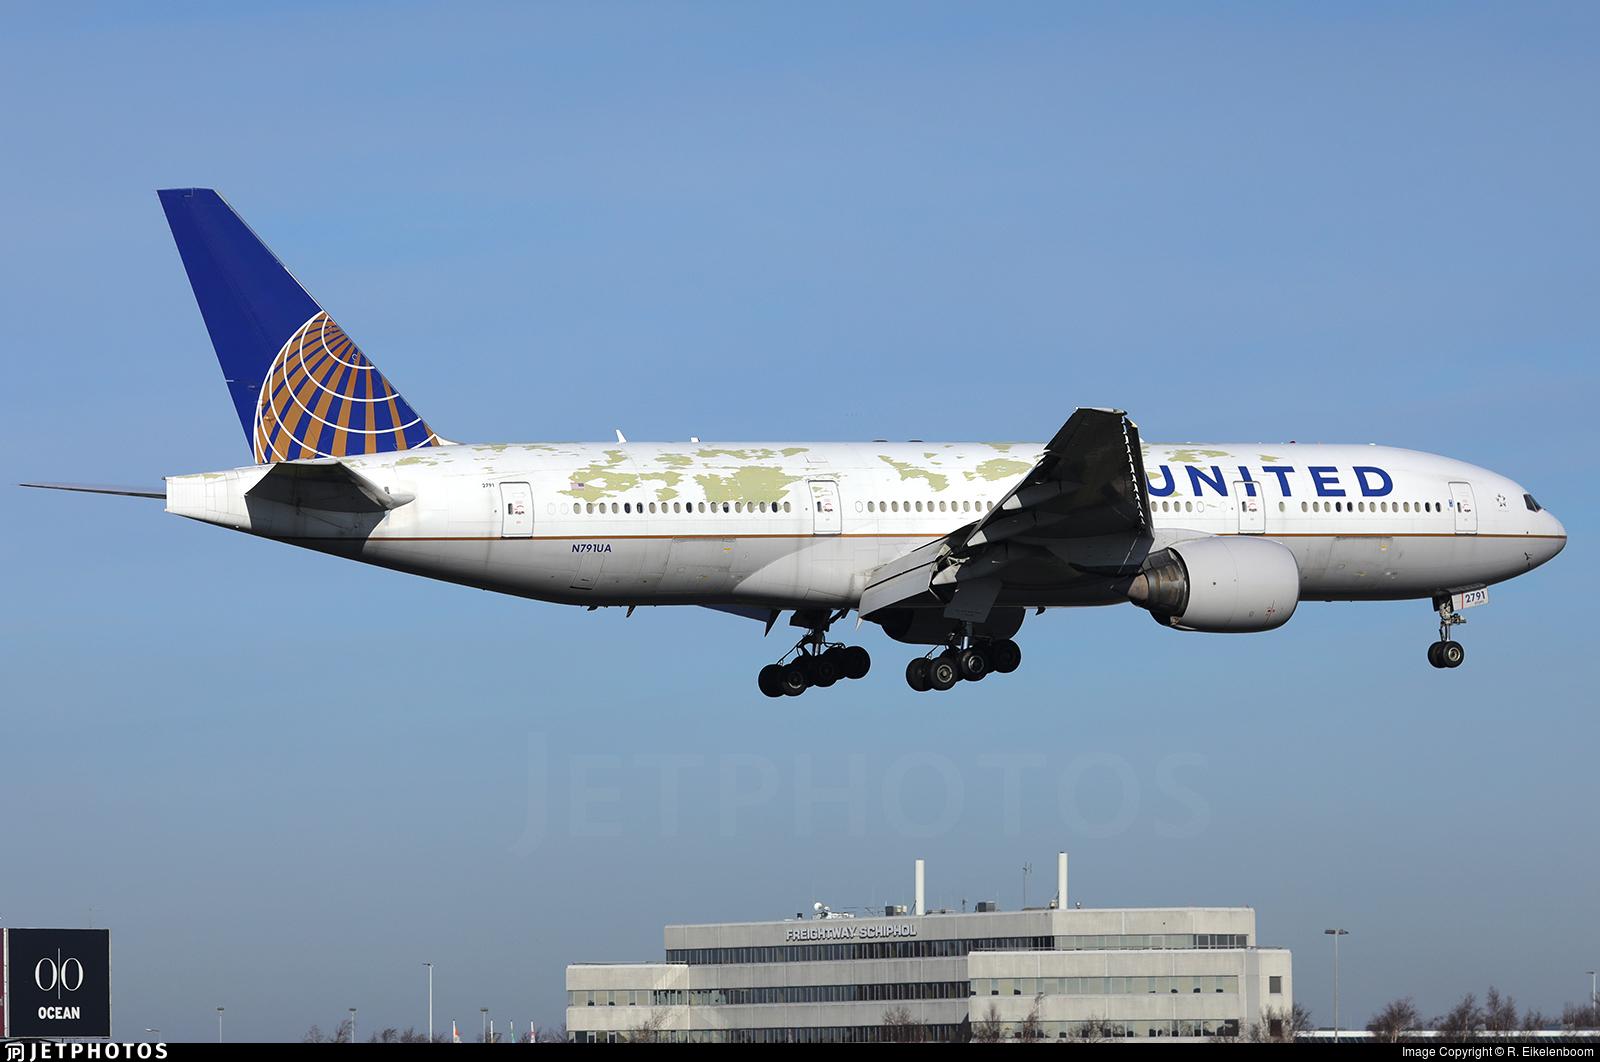 N791UA United 777-200 engine failure Pratt & Whitney PW4000 where all the 777s are grounding